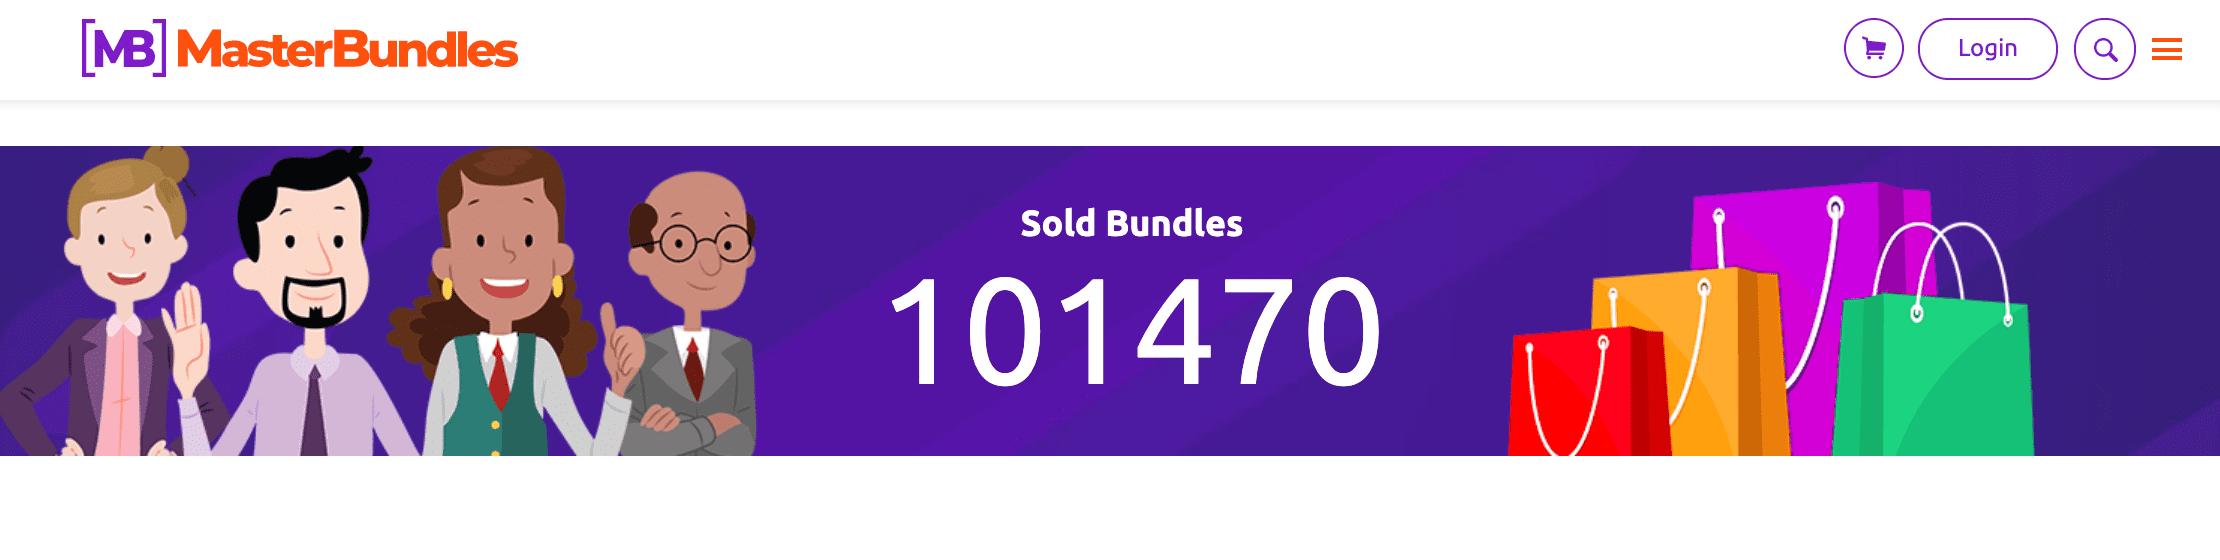 100000 sold bundles. Site screenshot.